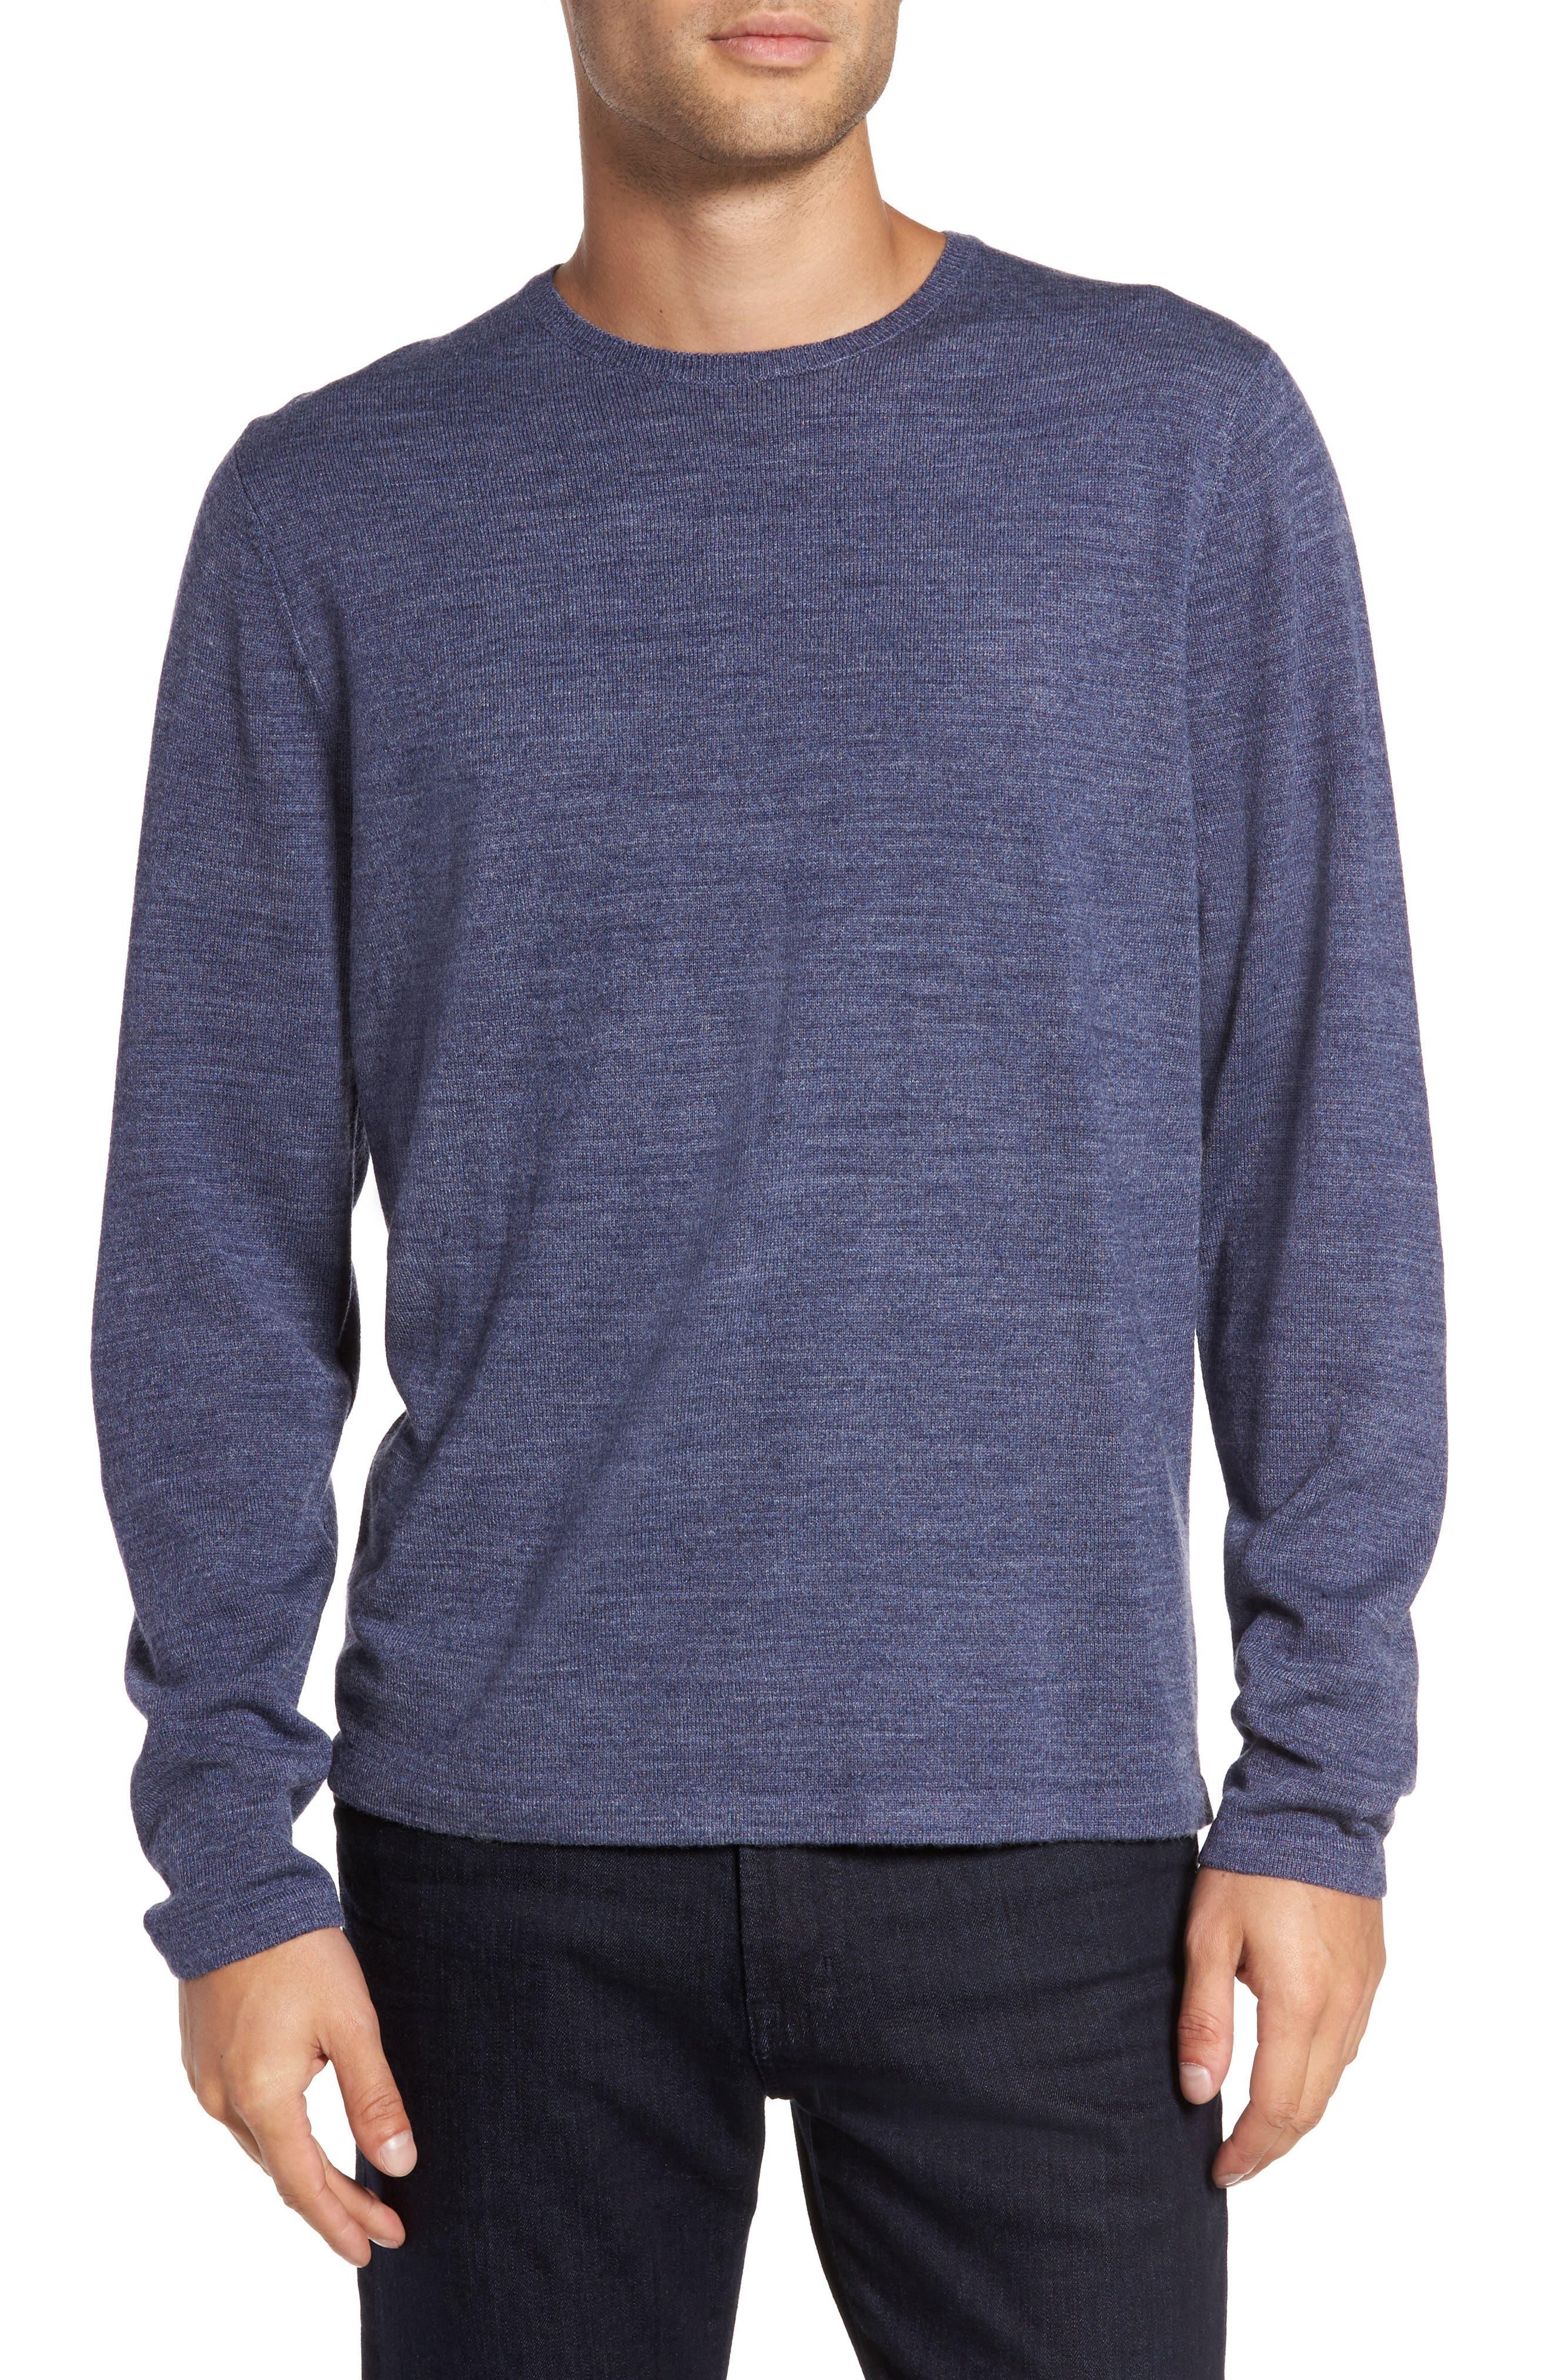 Merino Blend Crewneck Sweater,                         Main,                         color, Blue Ensign Heather